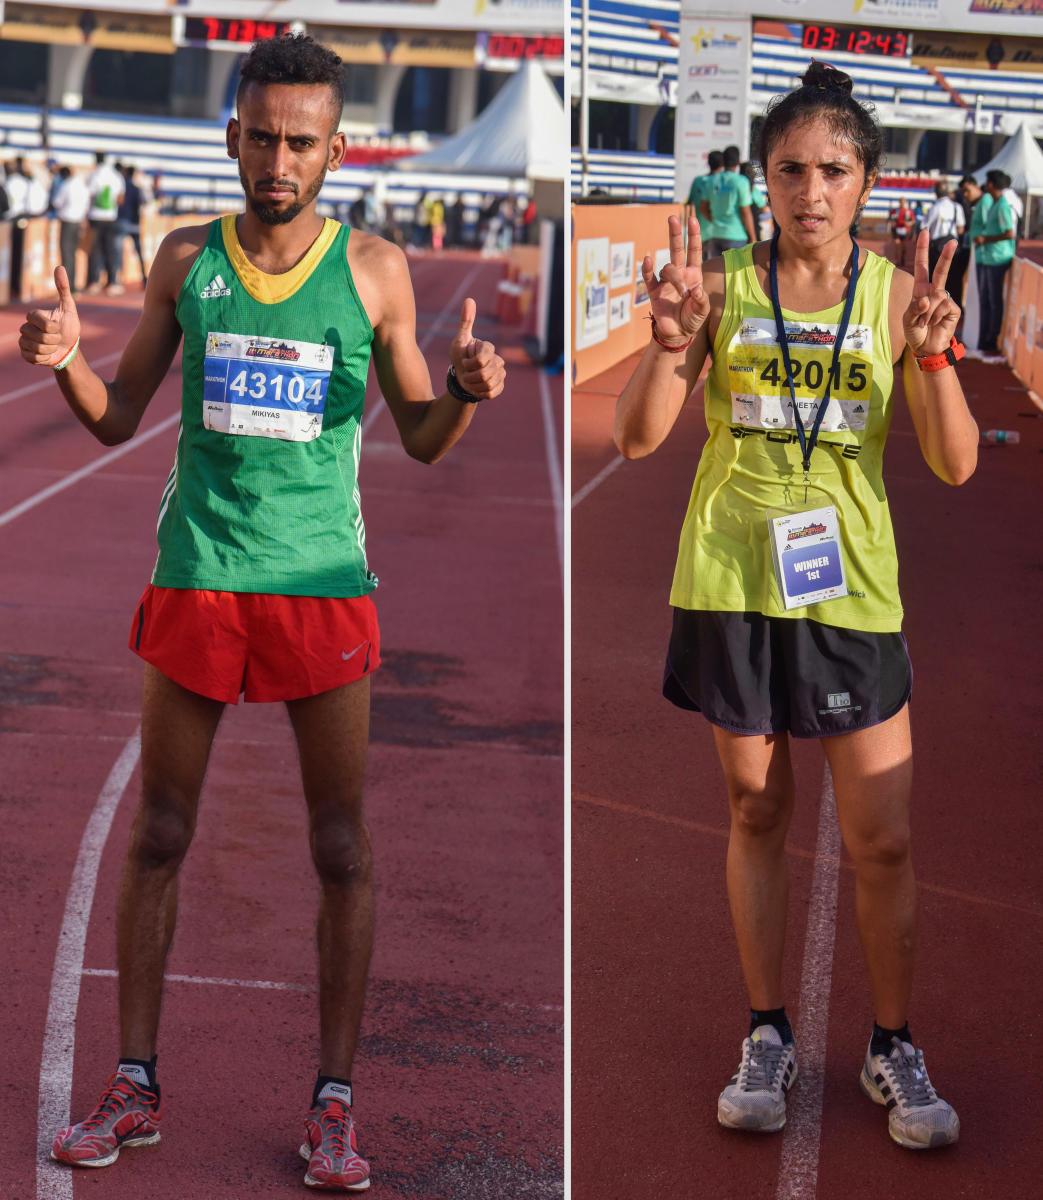 VICTORIOUS Ethiopia's Mikiyas Yemata (left) and Aneeta Chaudhary of India won the men's and women's titles respectively in the Bengaluru Marathon at the Sree Kanteerava Stadium on Sunday. DH Photo/ S K Dinesh